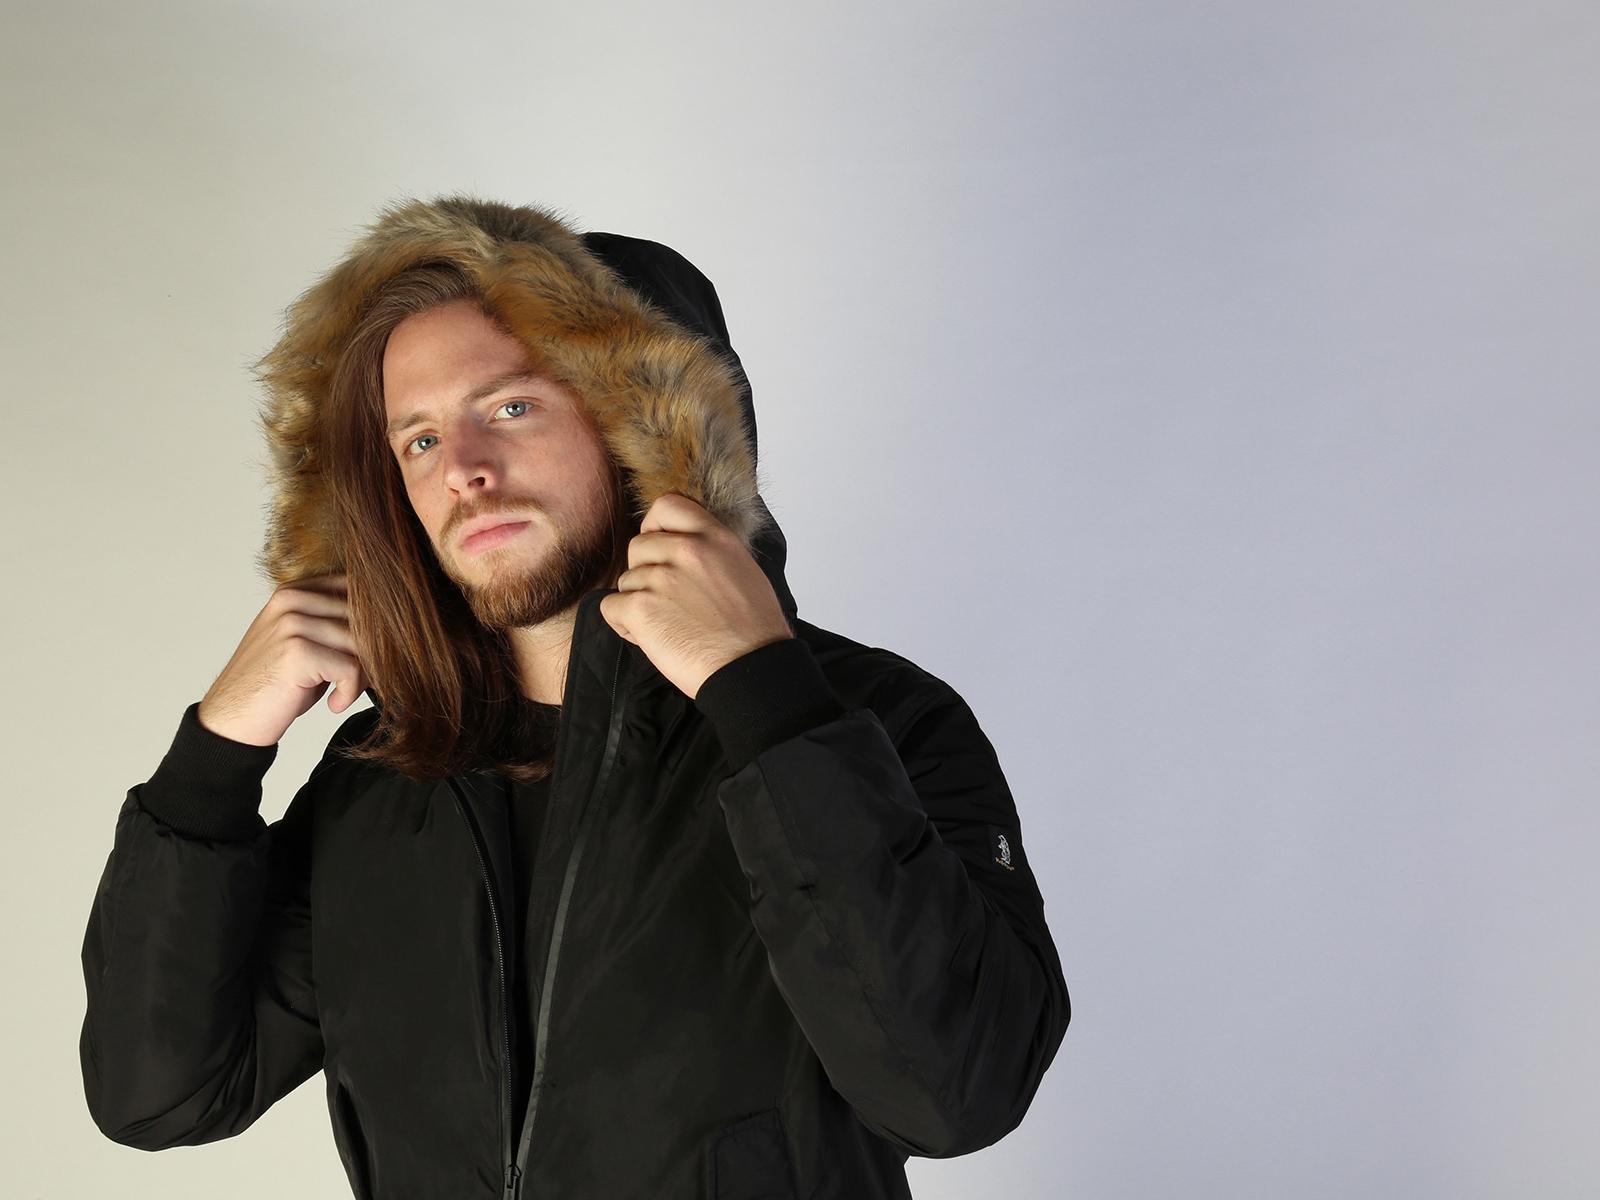 Refrigue jackets